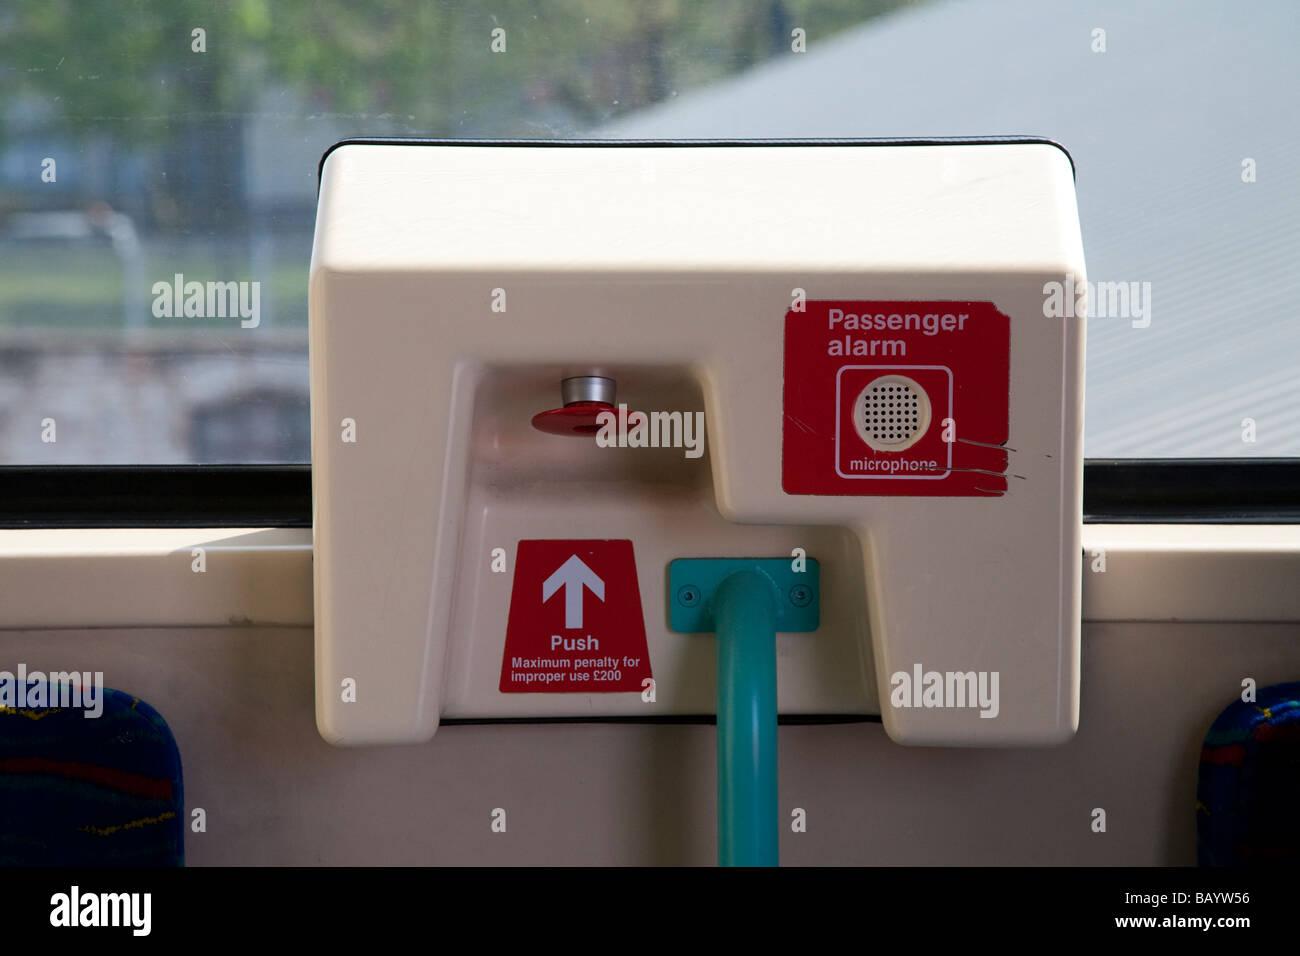 DLR Passenger Alarm London UK - Stock Image